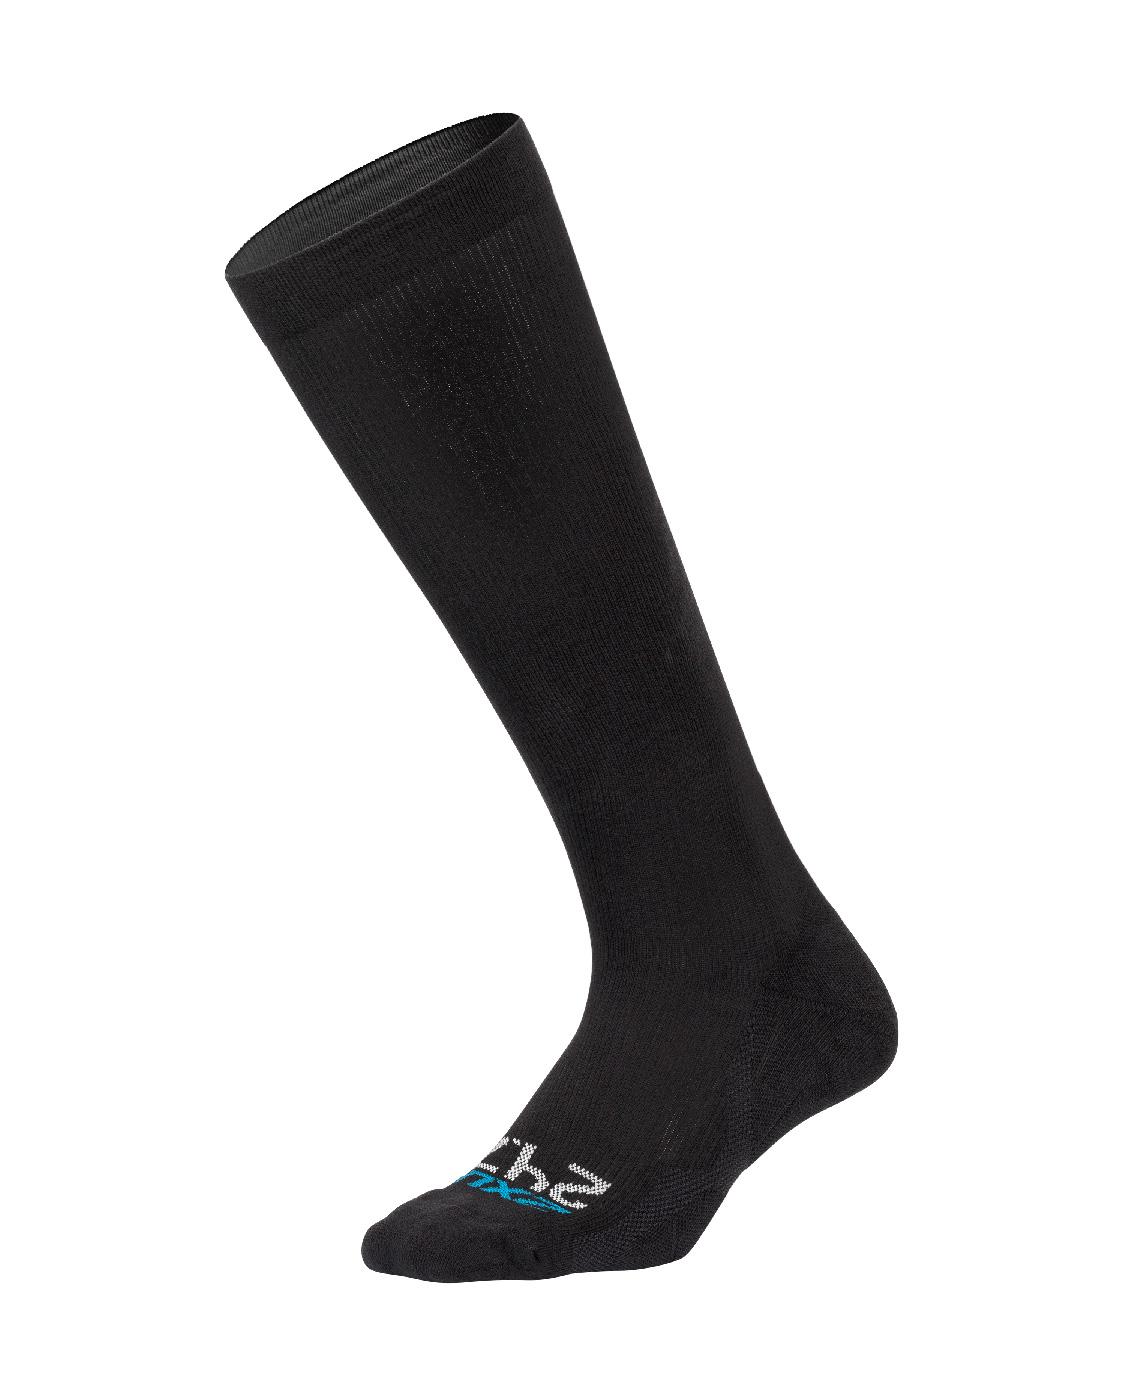 2XU Unisex 24/7 Compression Socks - Black/Black